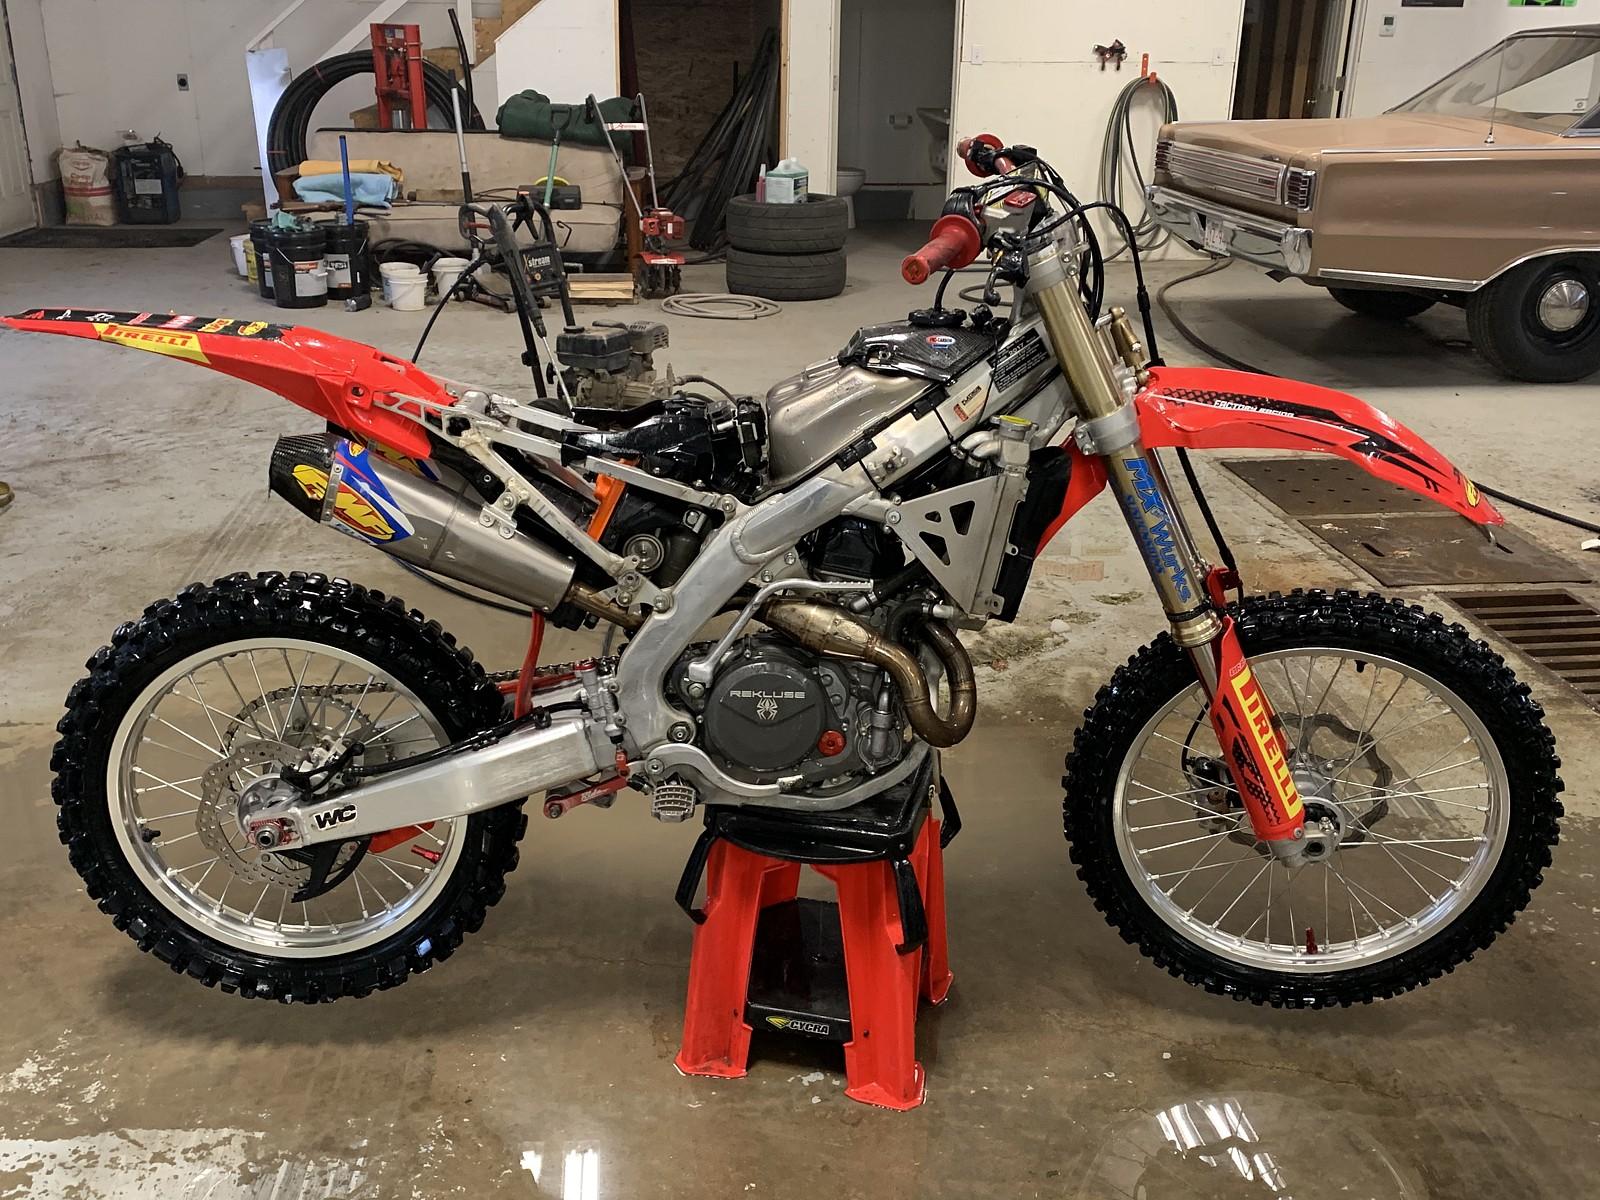 A1EDB97E-14C3-43B7-B444-05F8D8A1834C - whitechapel44 - Motocross Pictures - Vital MX